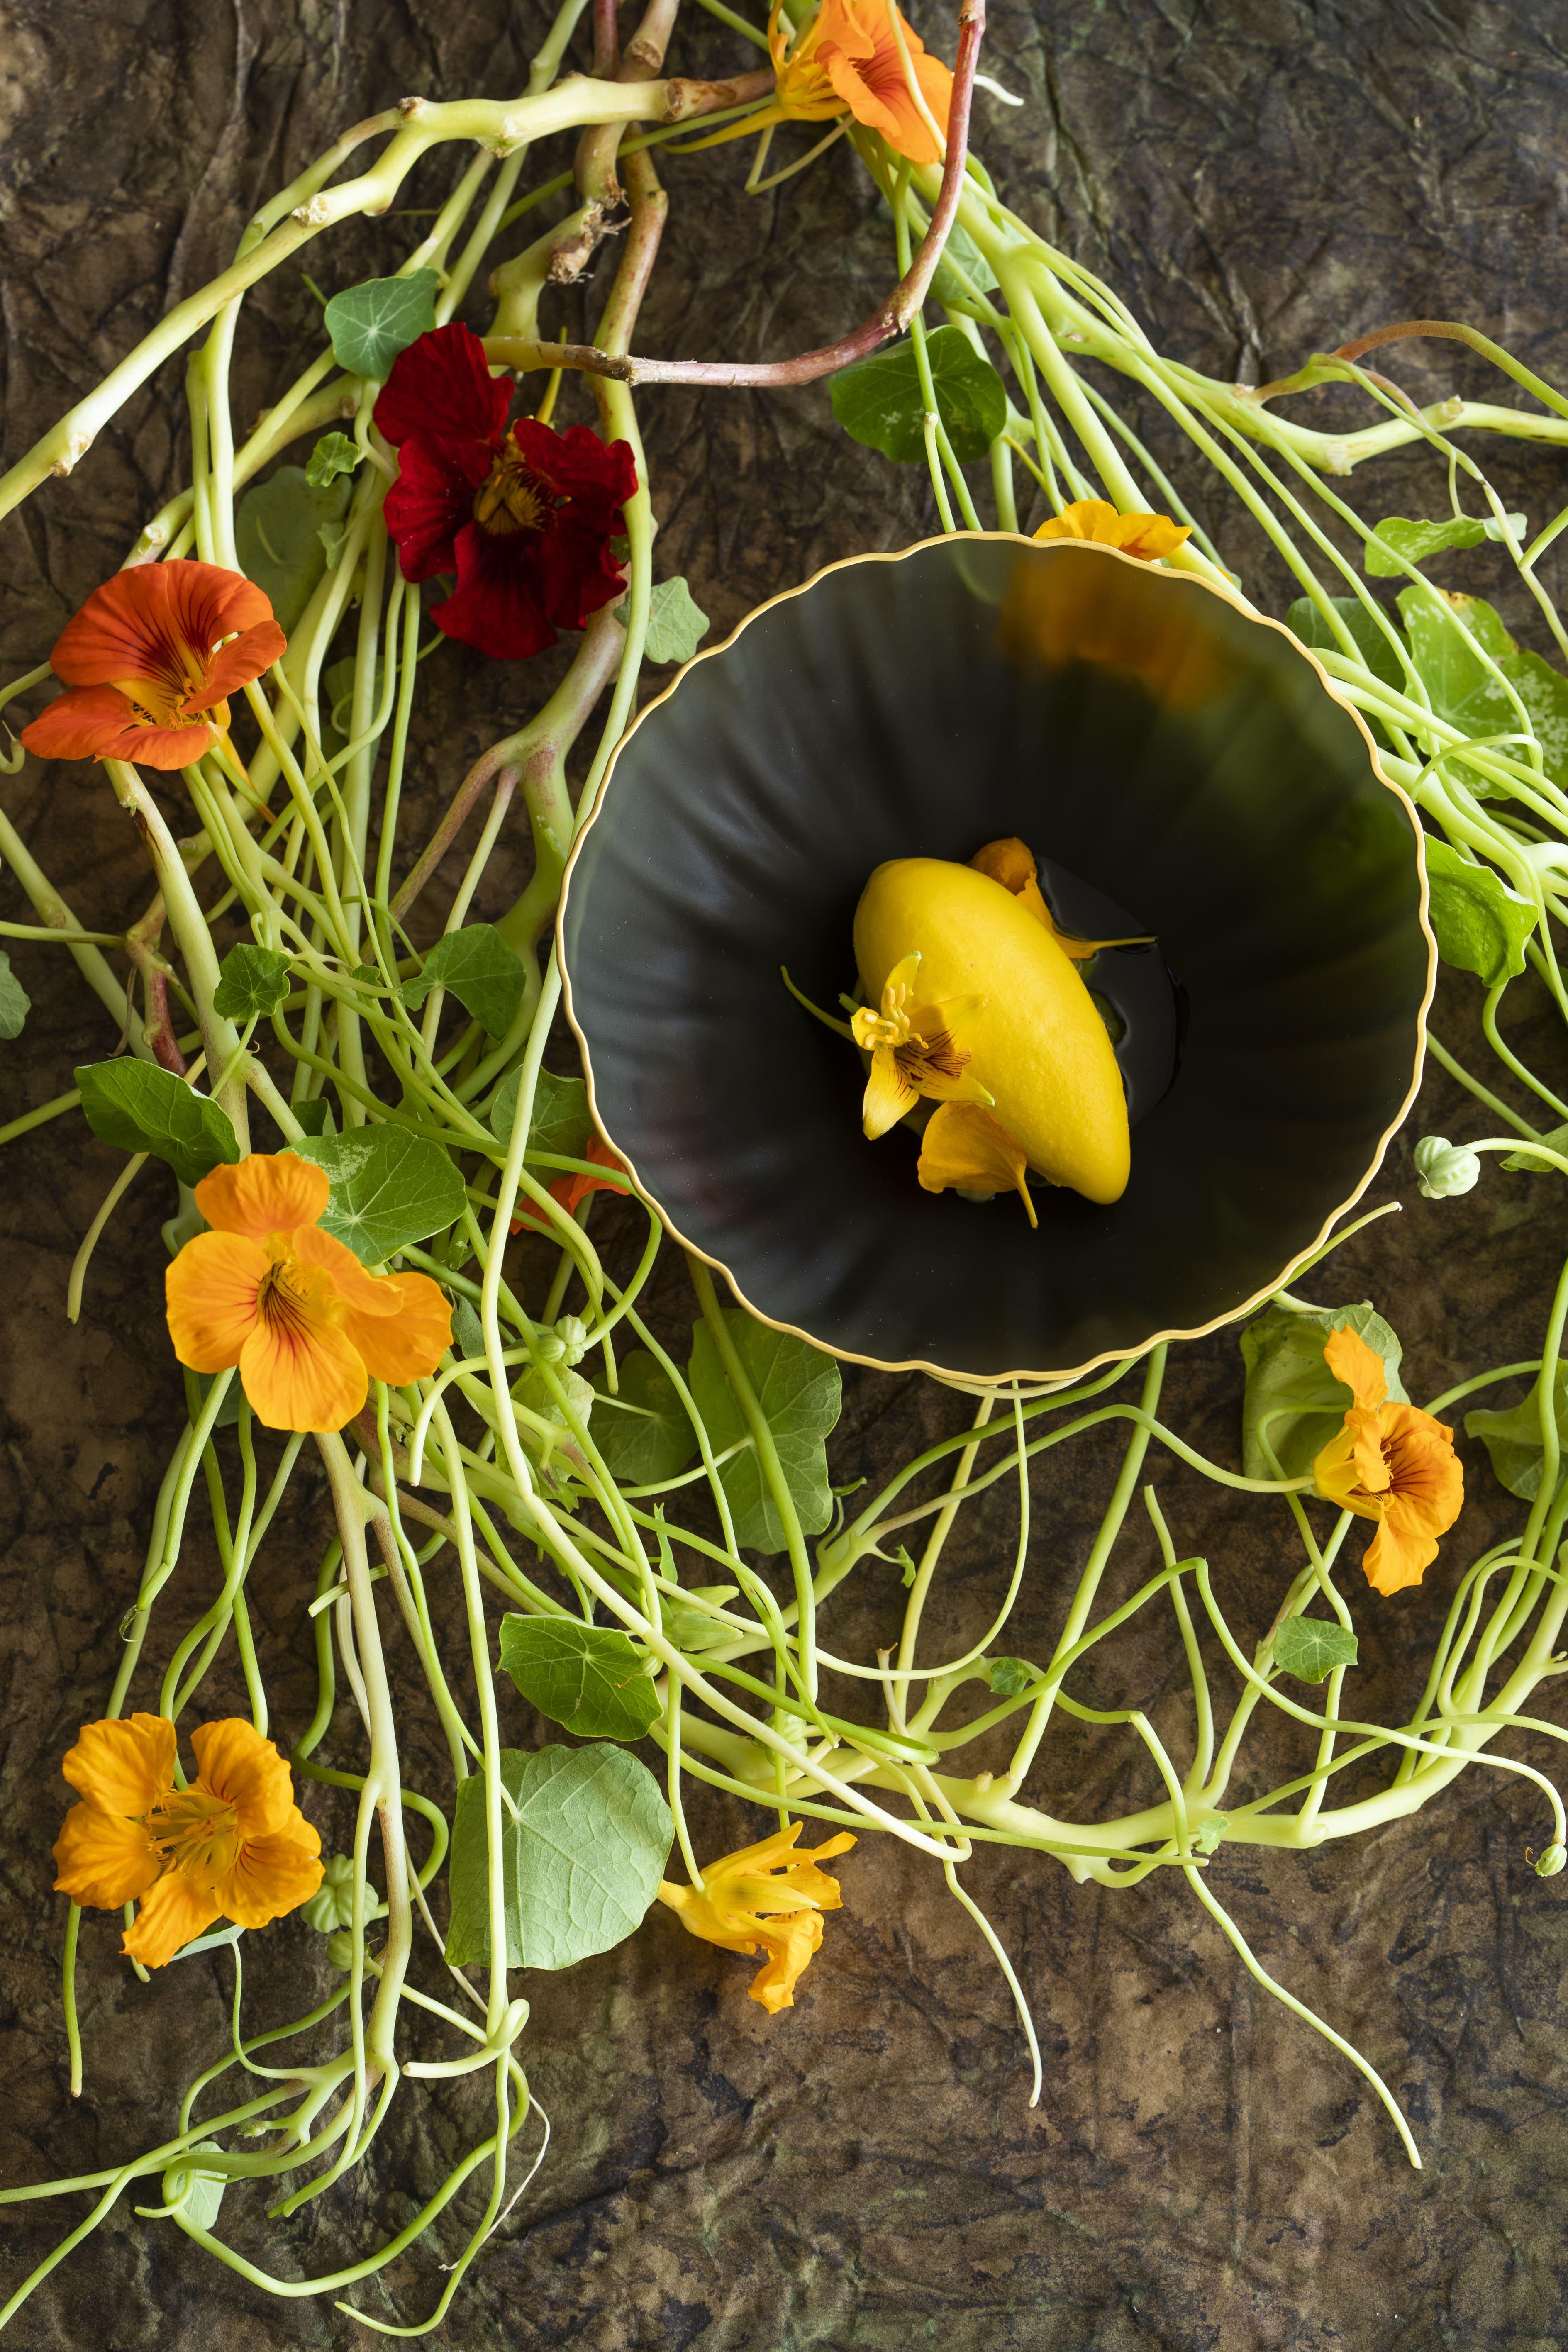 Capucine, Mirazur Flowers Universe @Matteo Carassale